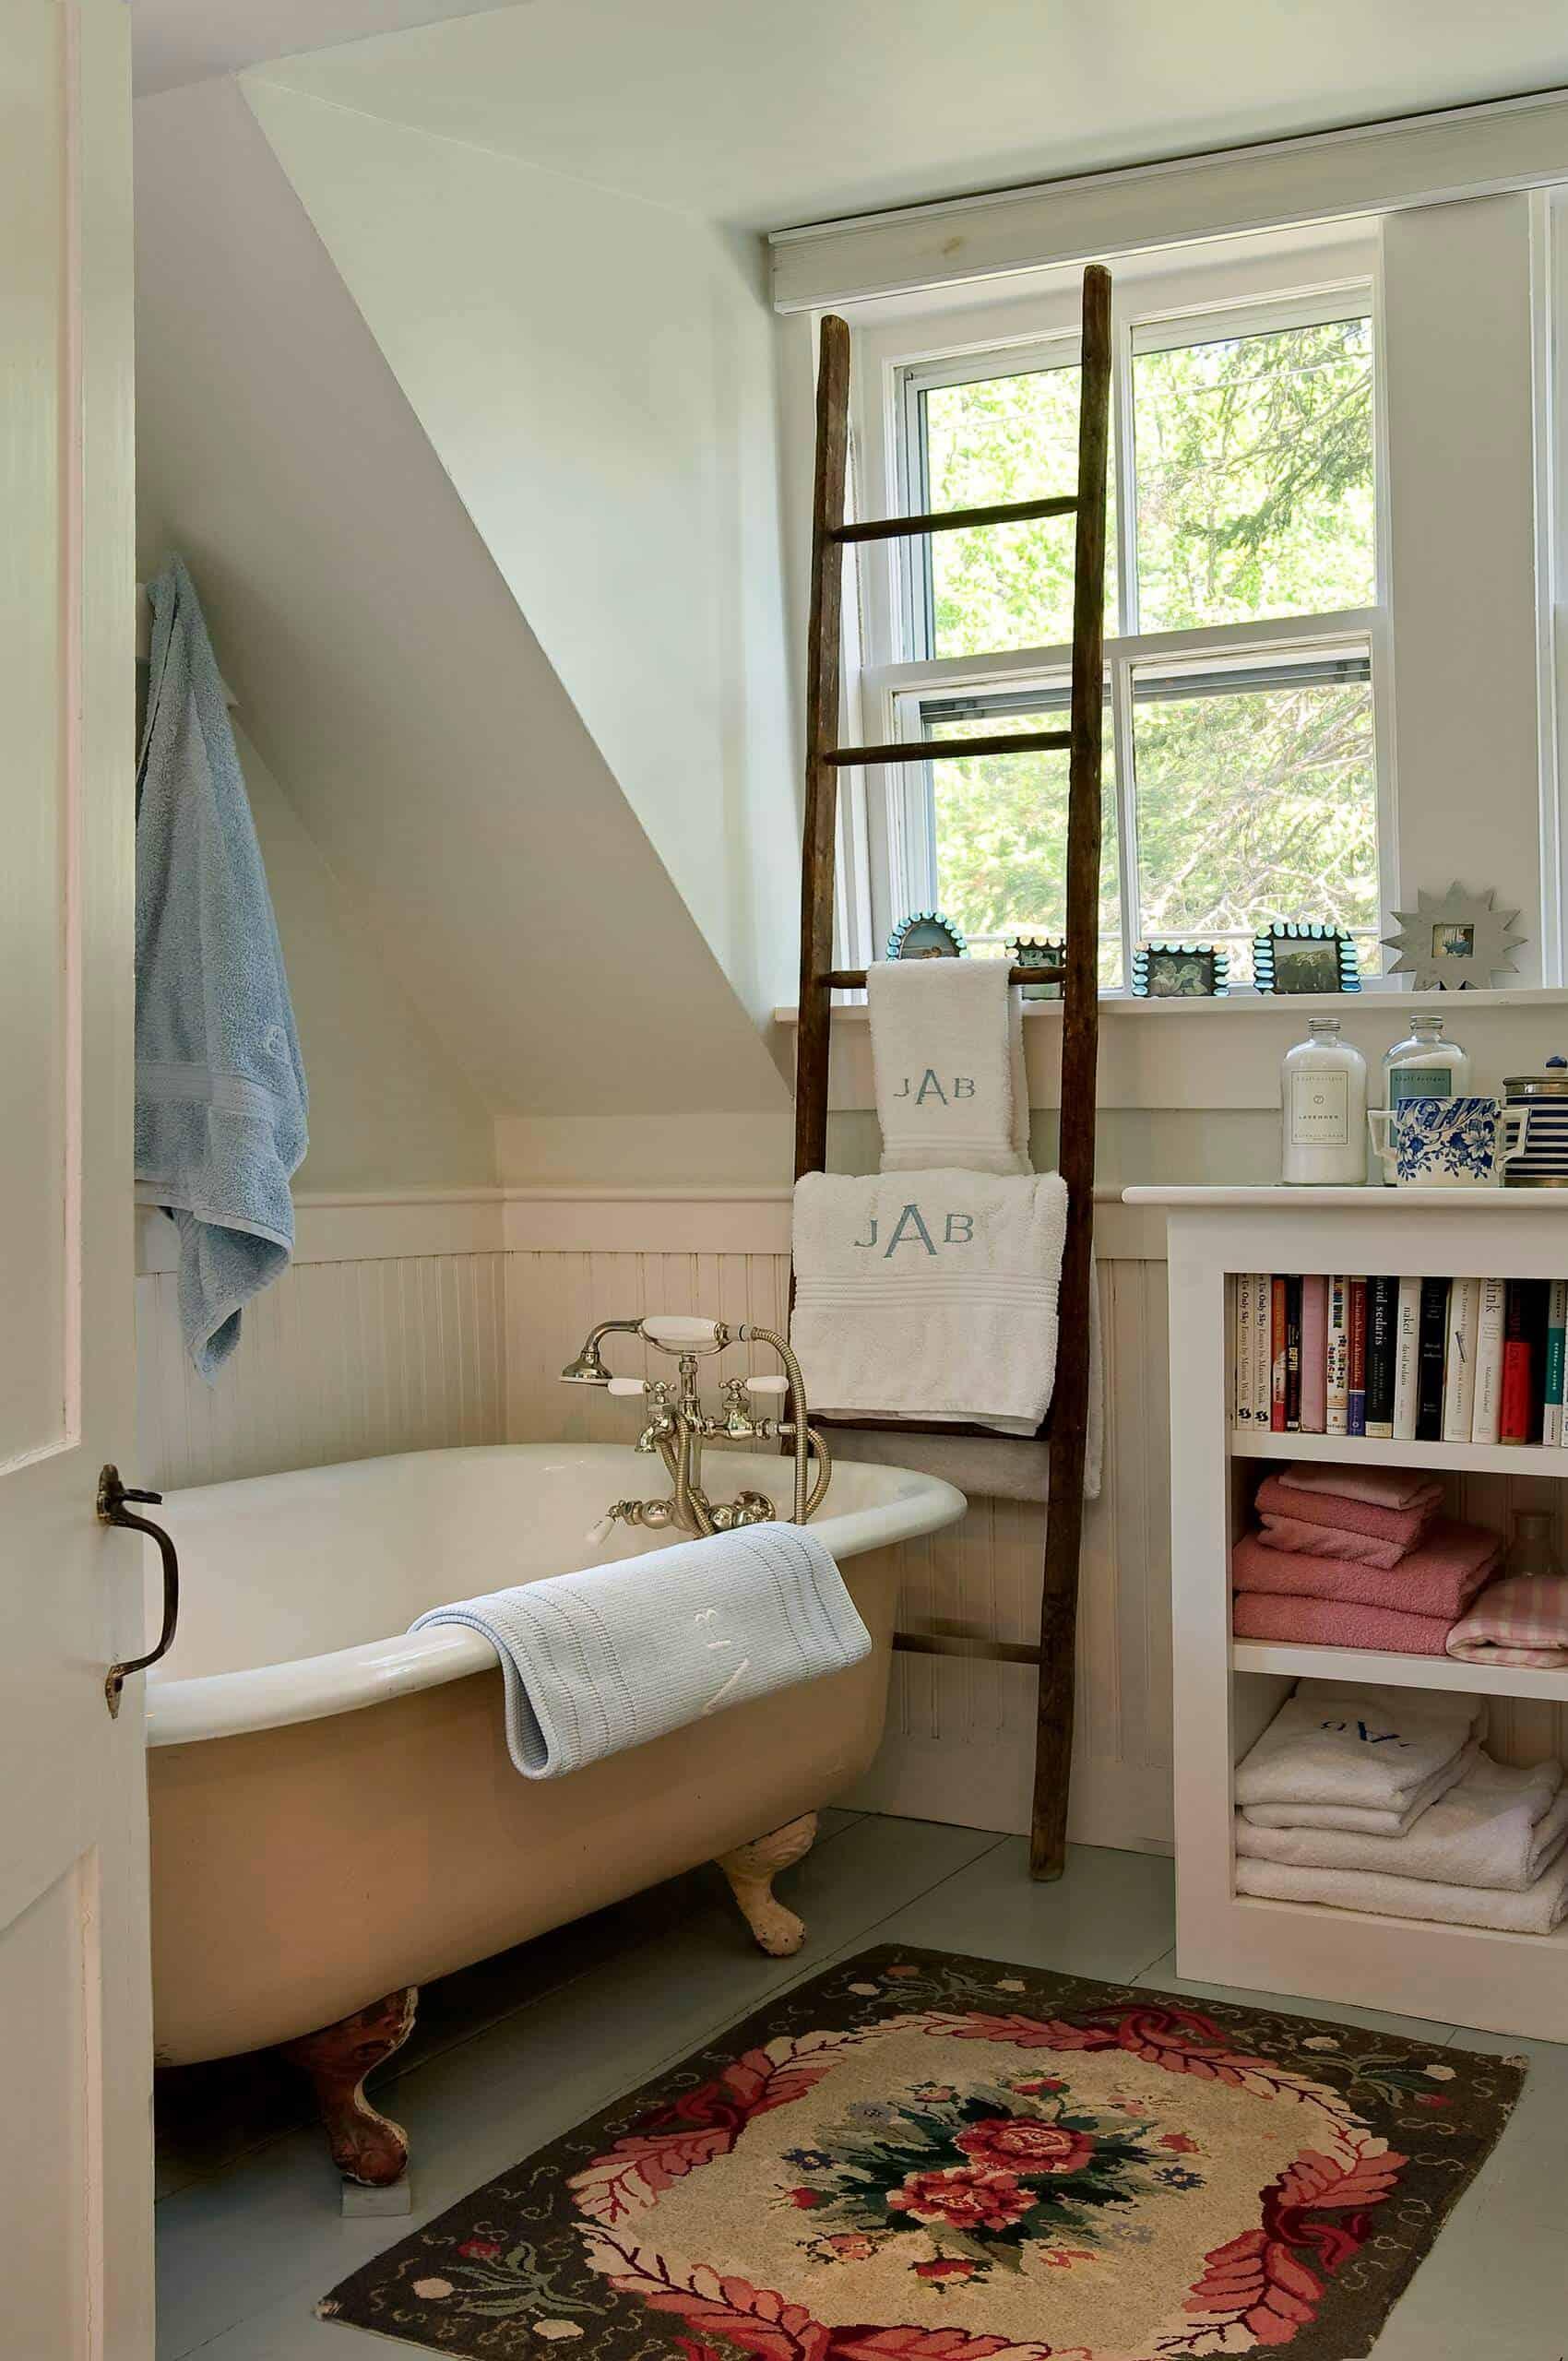 37 Towel Storage Ideas For Your Bathroom 2021 Edition